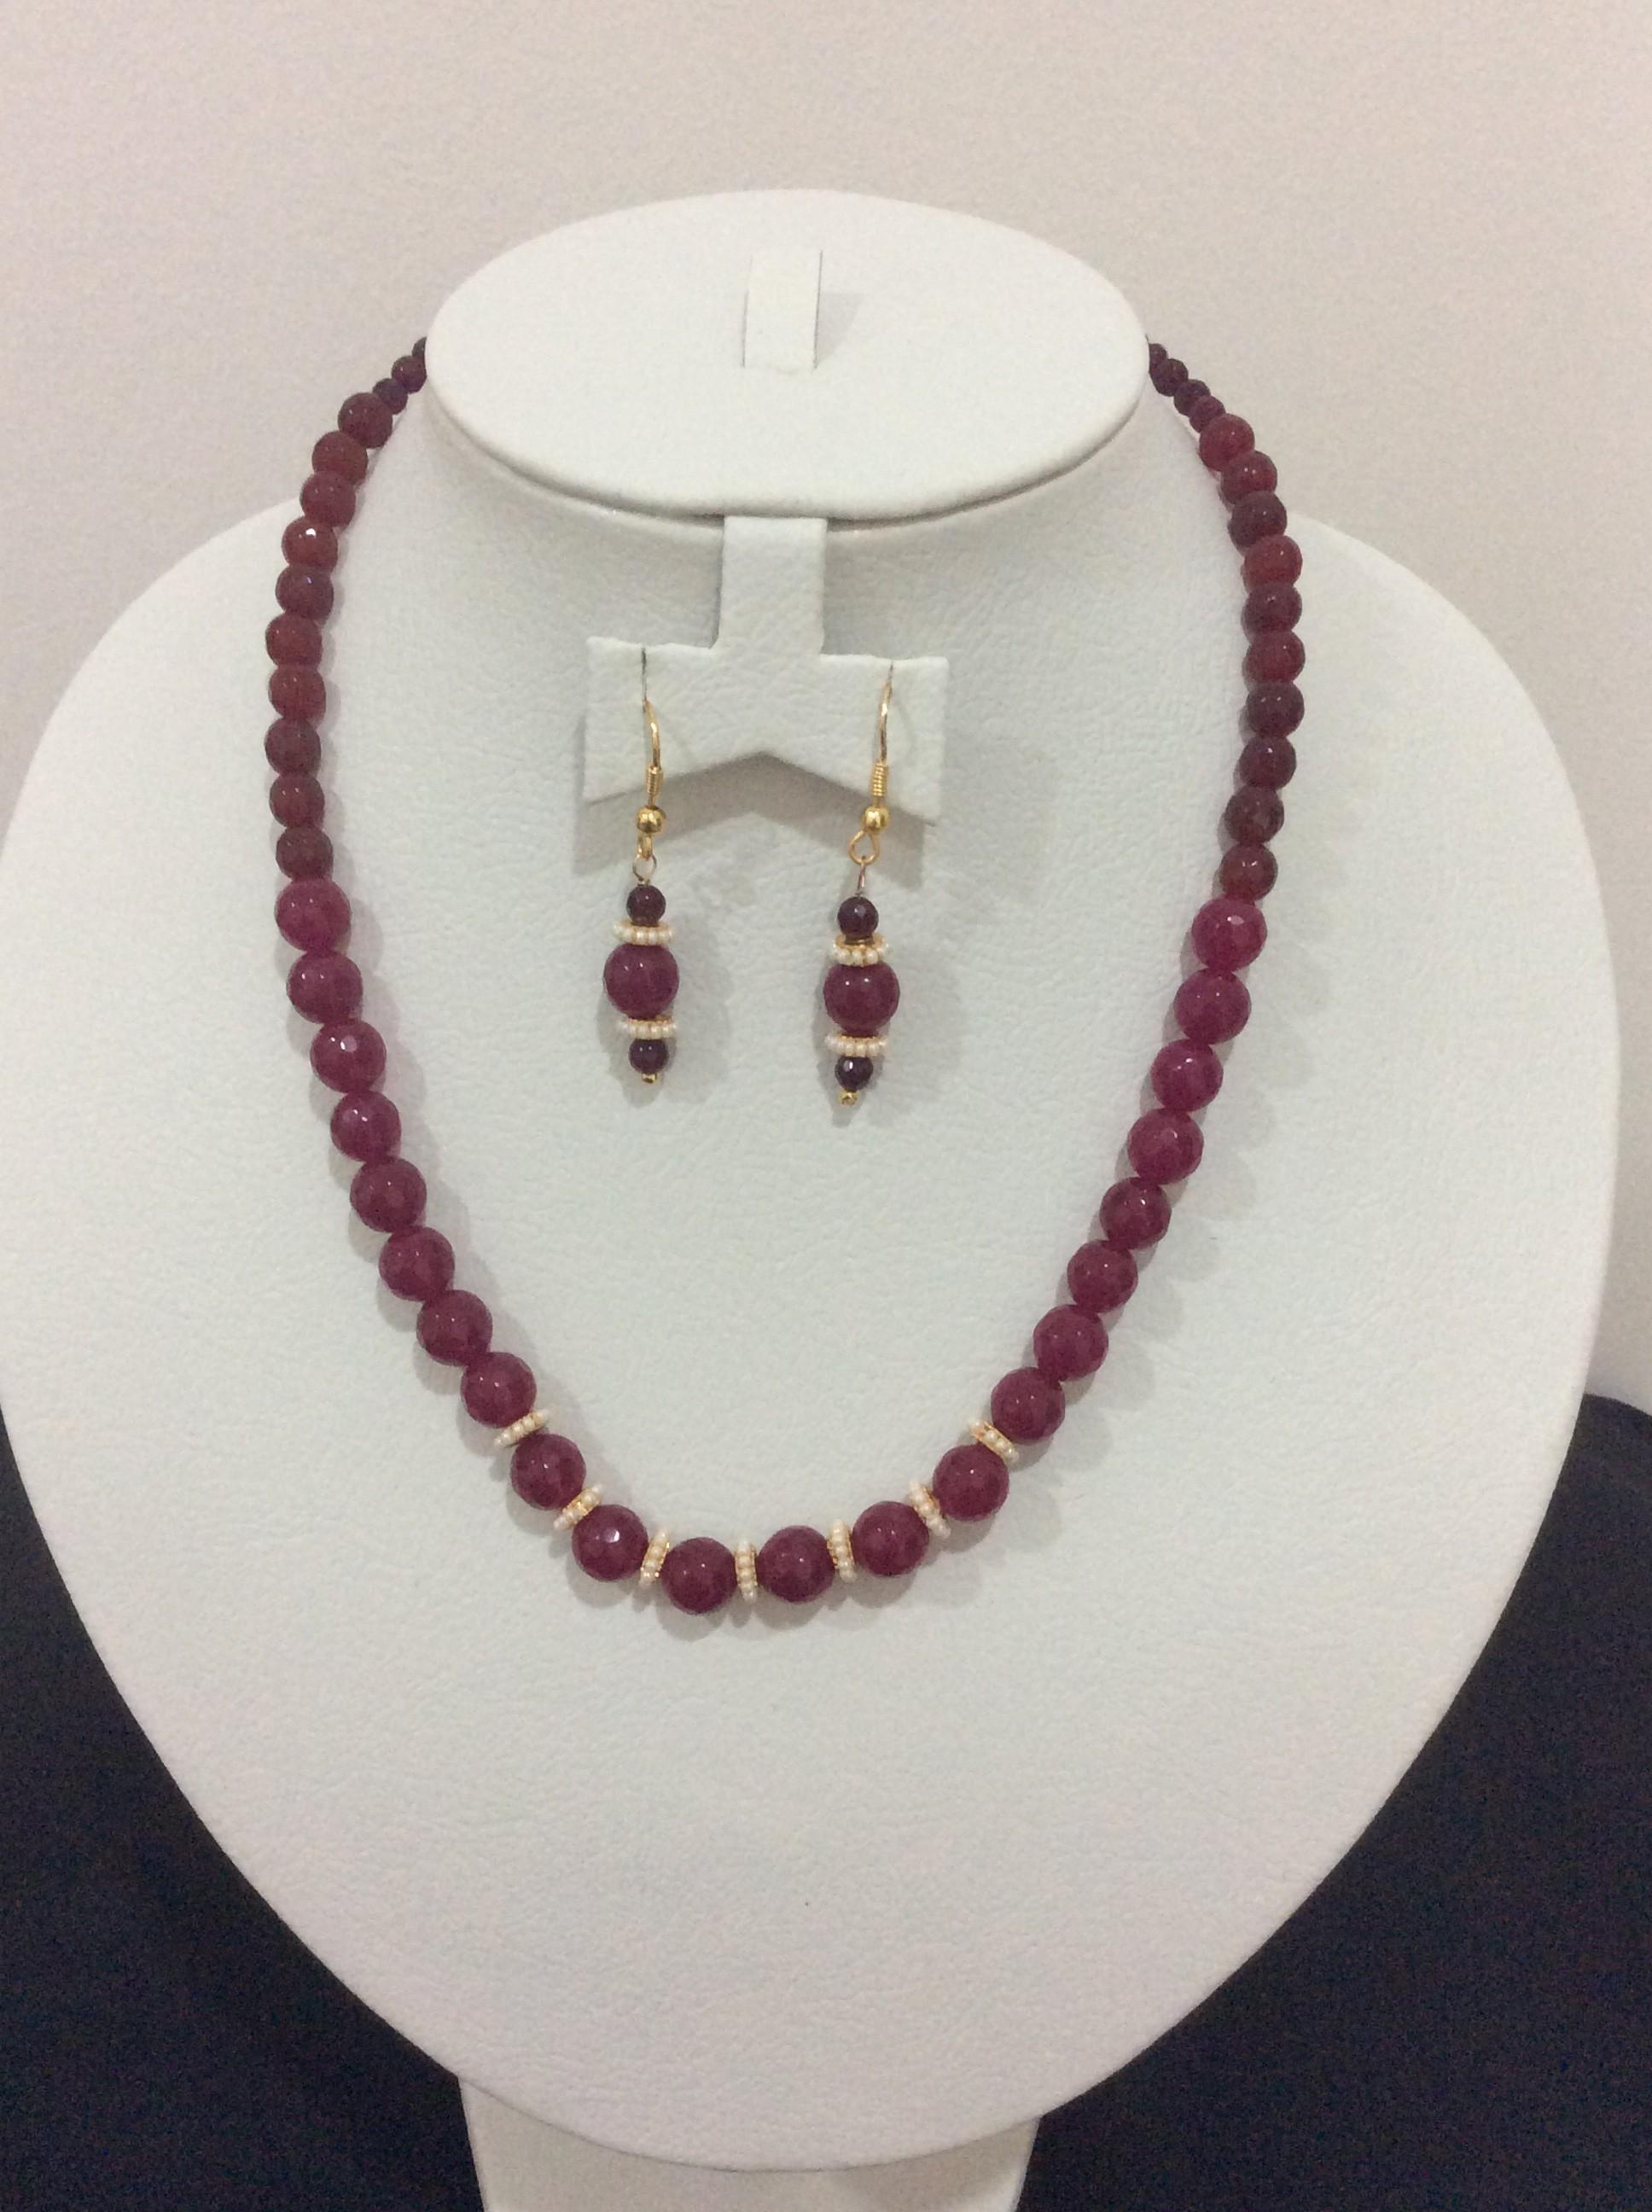 Finest Handmade Semi-Precious Bead Fashion Jewelry | Tulasi Trendz QC84